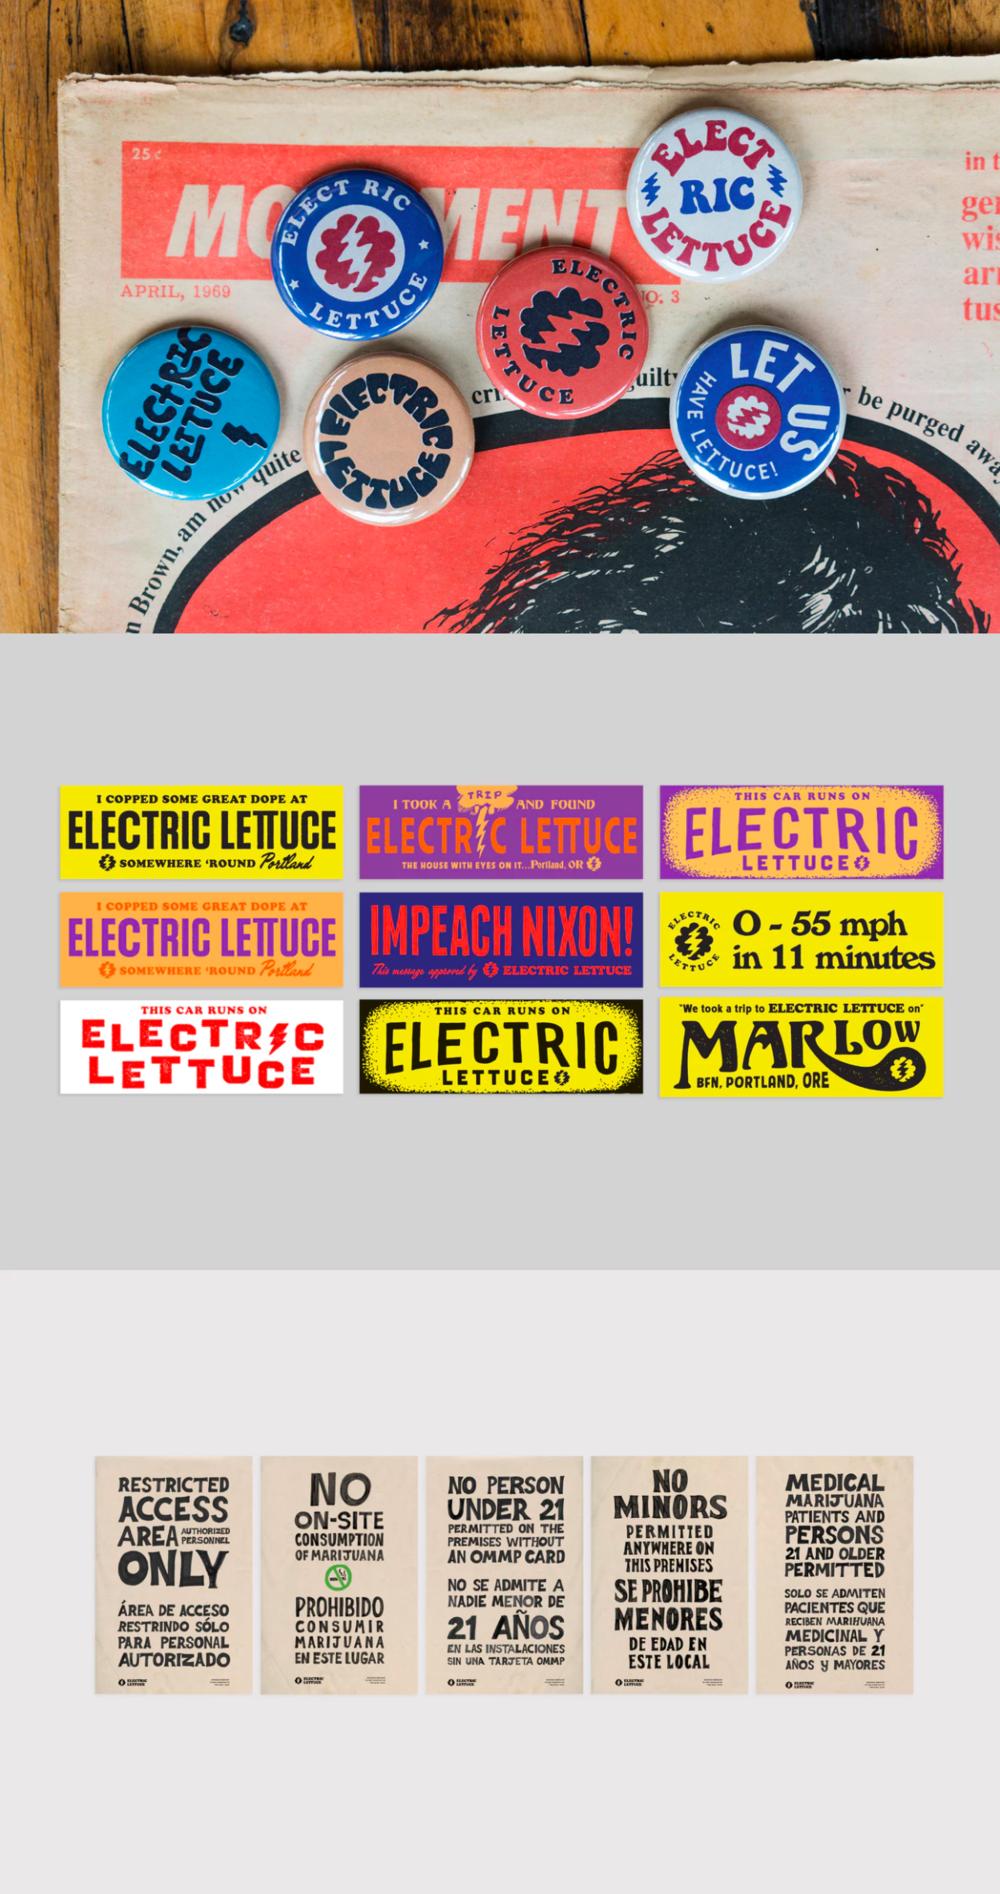 screencapture-omfgco-work-electric-lettuce-2018-04-20-20_47_42.png